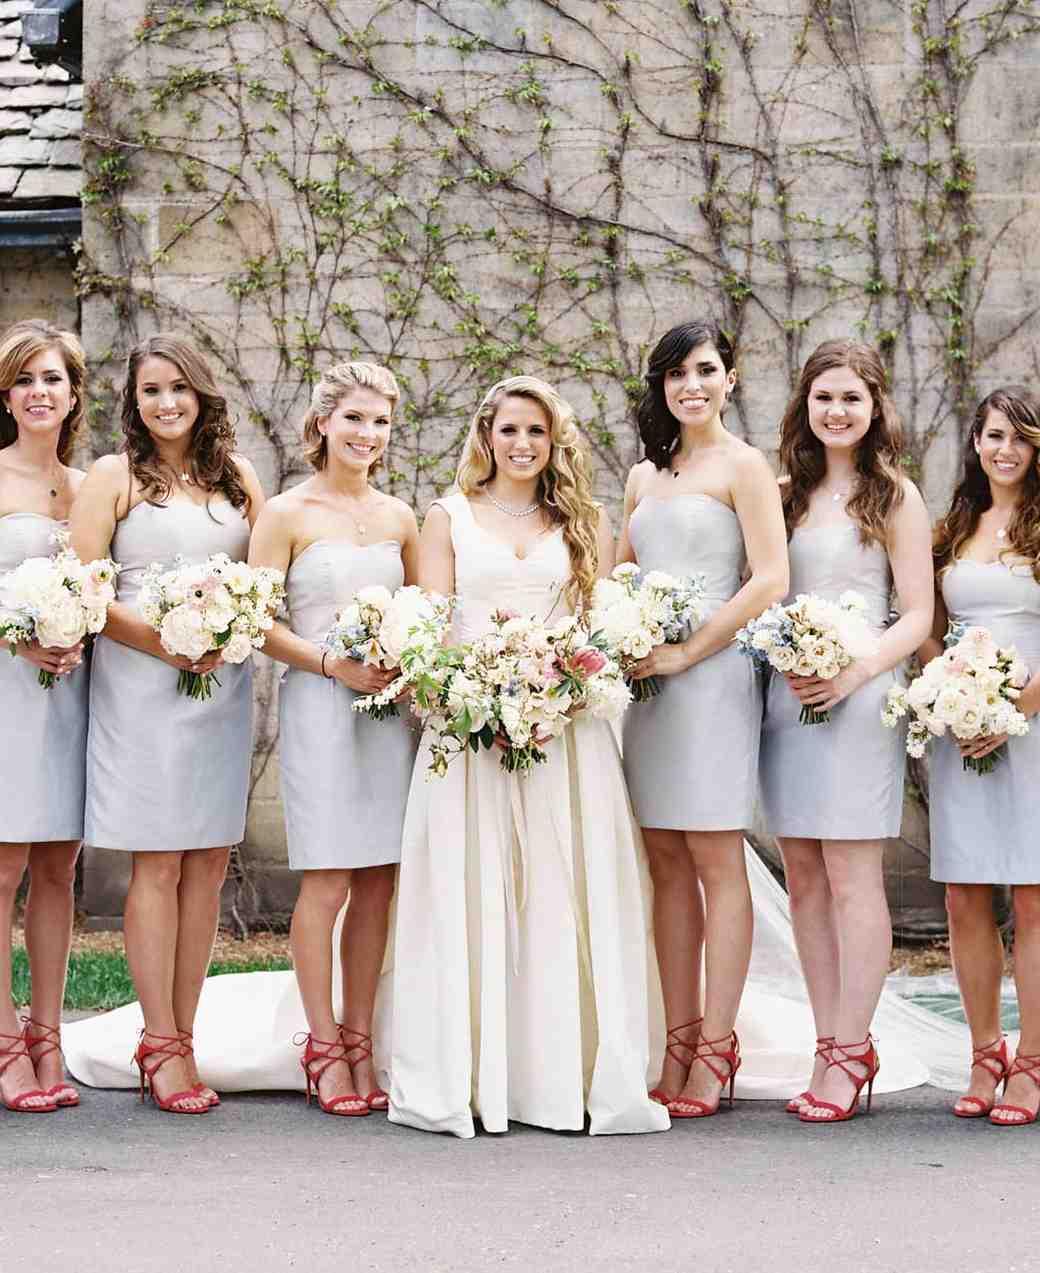 nikki-kiff-wedding-bridesmaids-004717004-s112766-0316.jpg